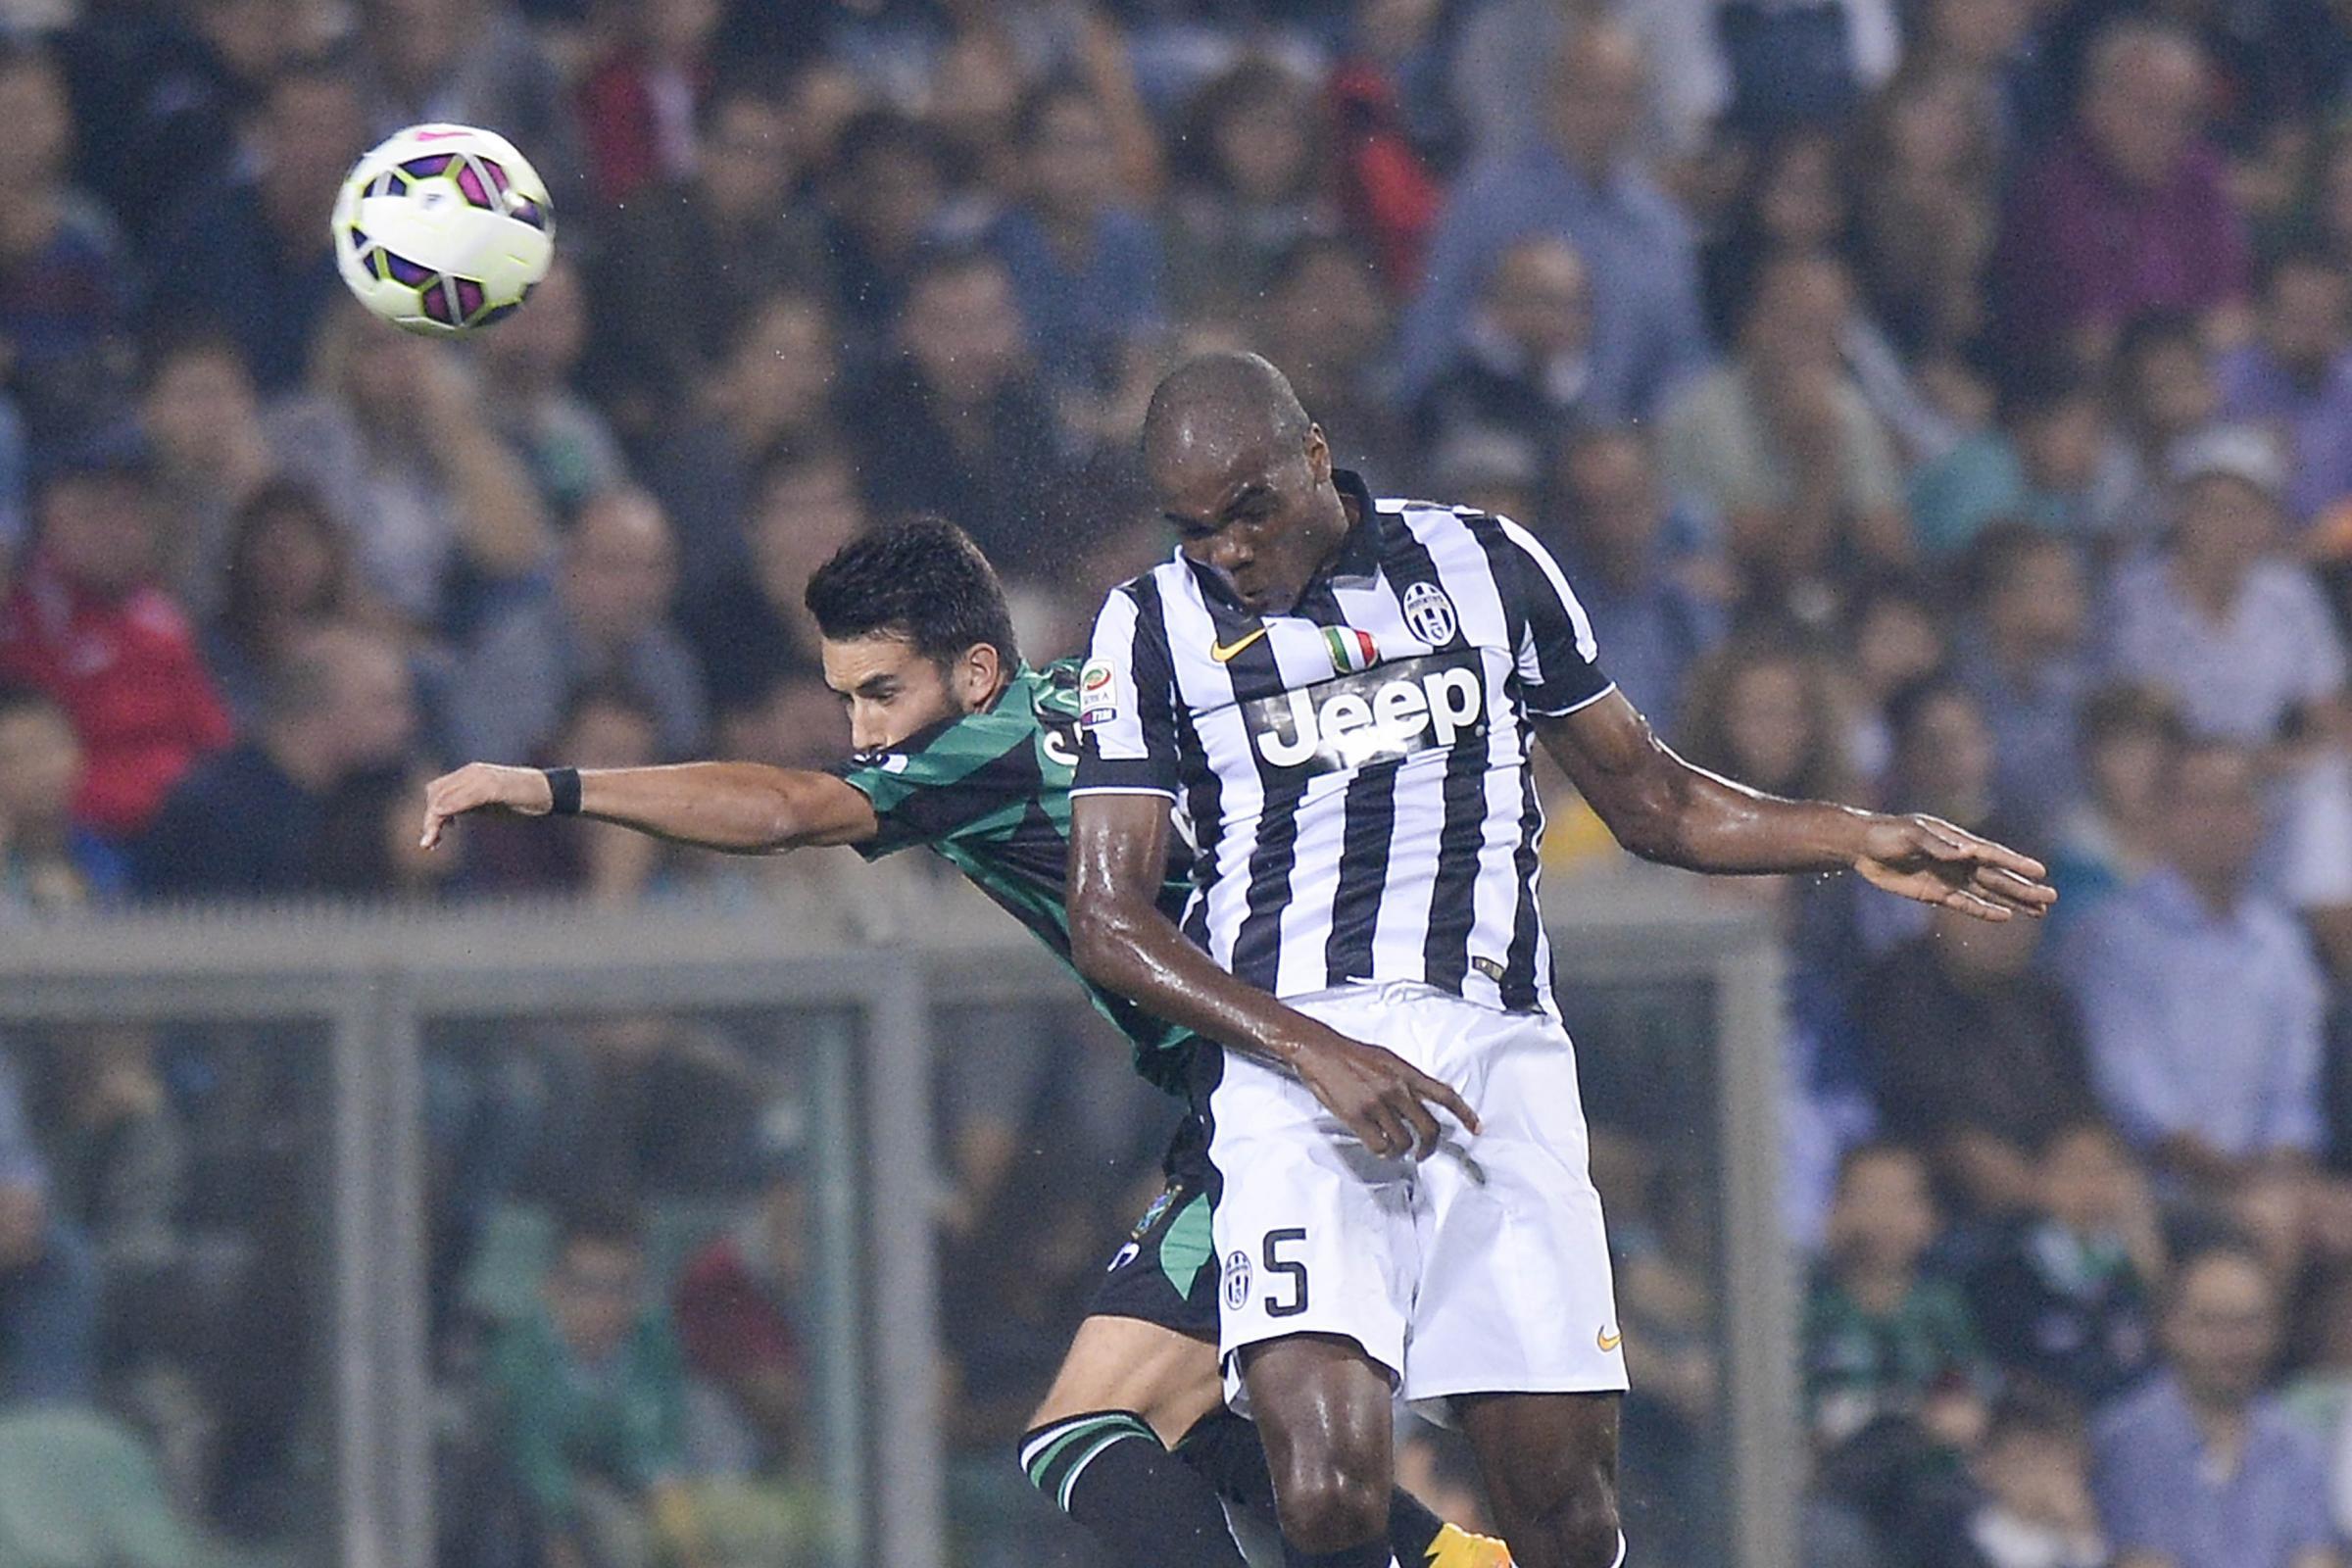 Sassuolo Mot Juventus: SASSUOLO-JUVENTUS (RISULTATO 1-1), La Diretta